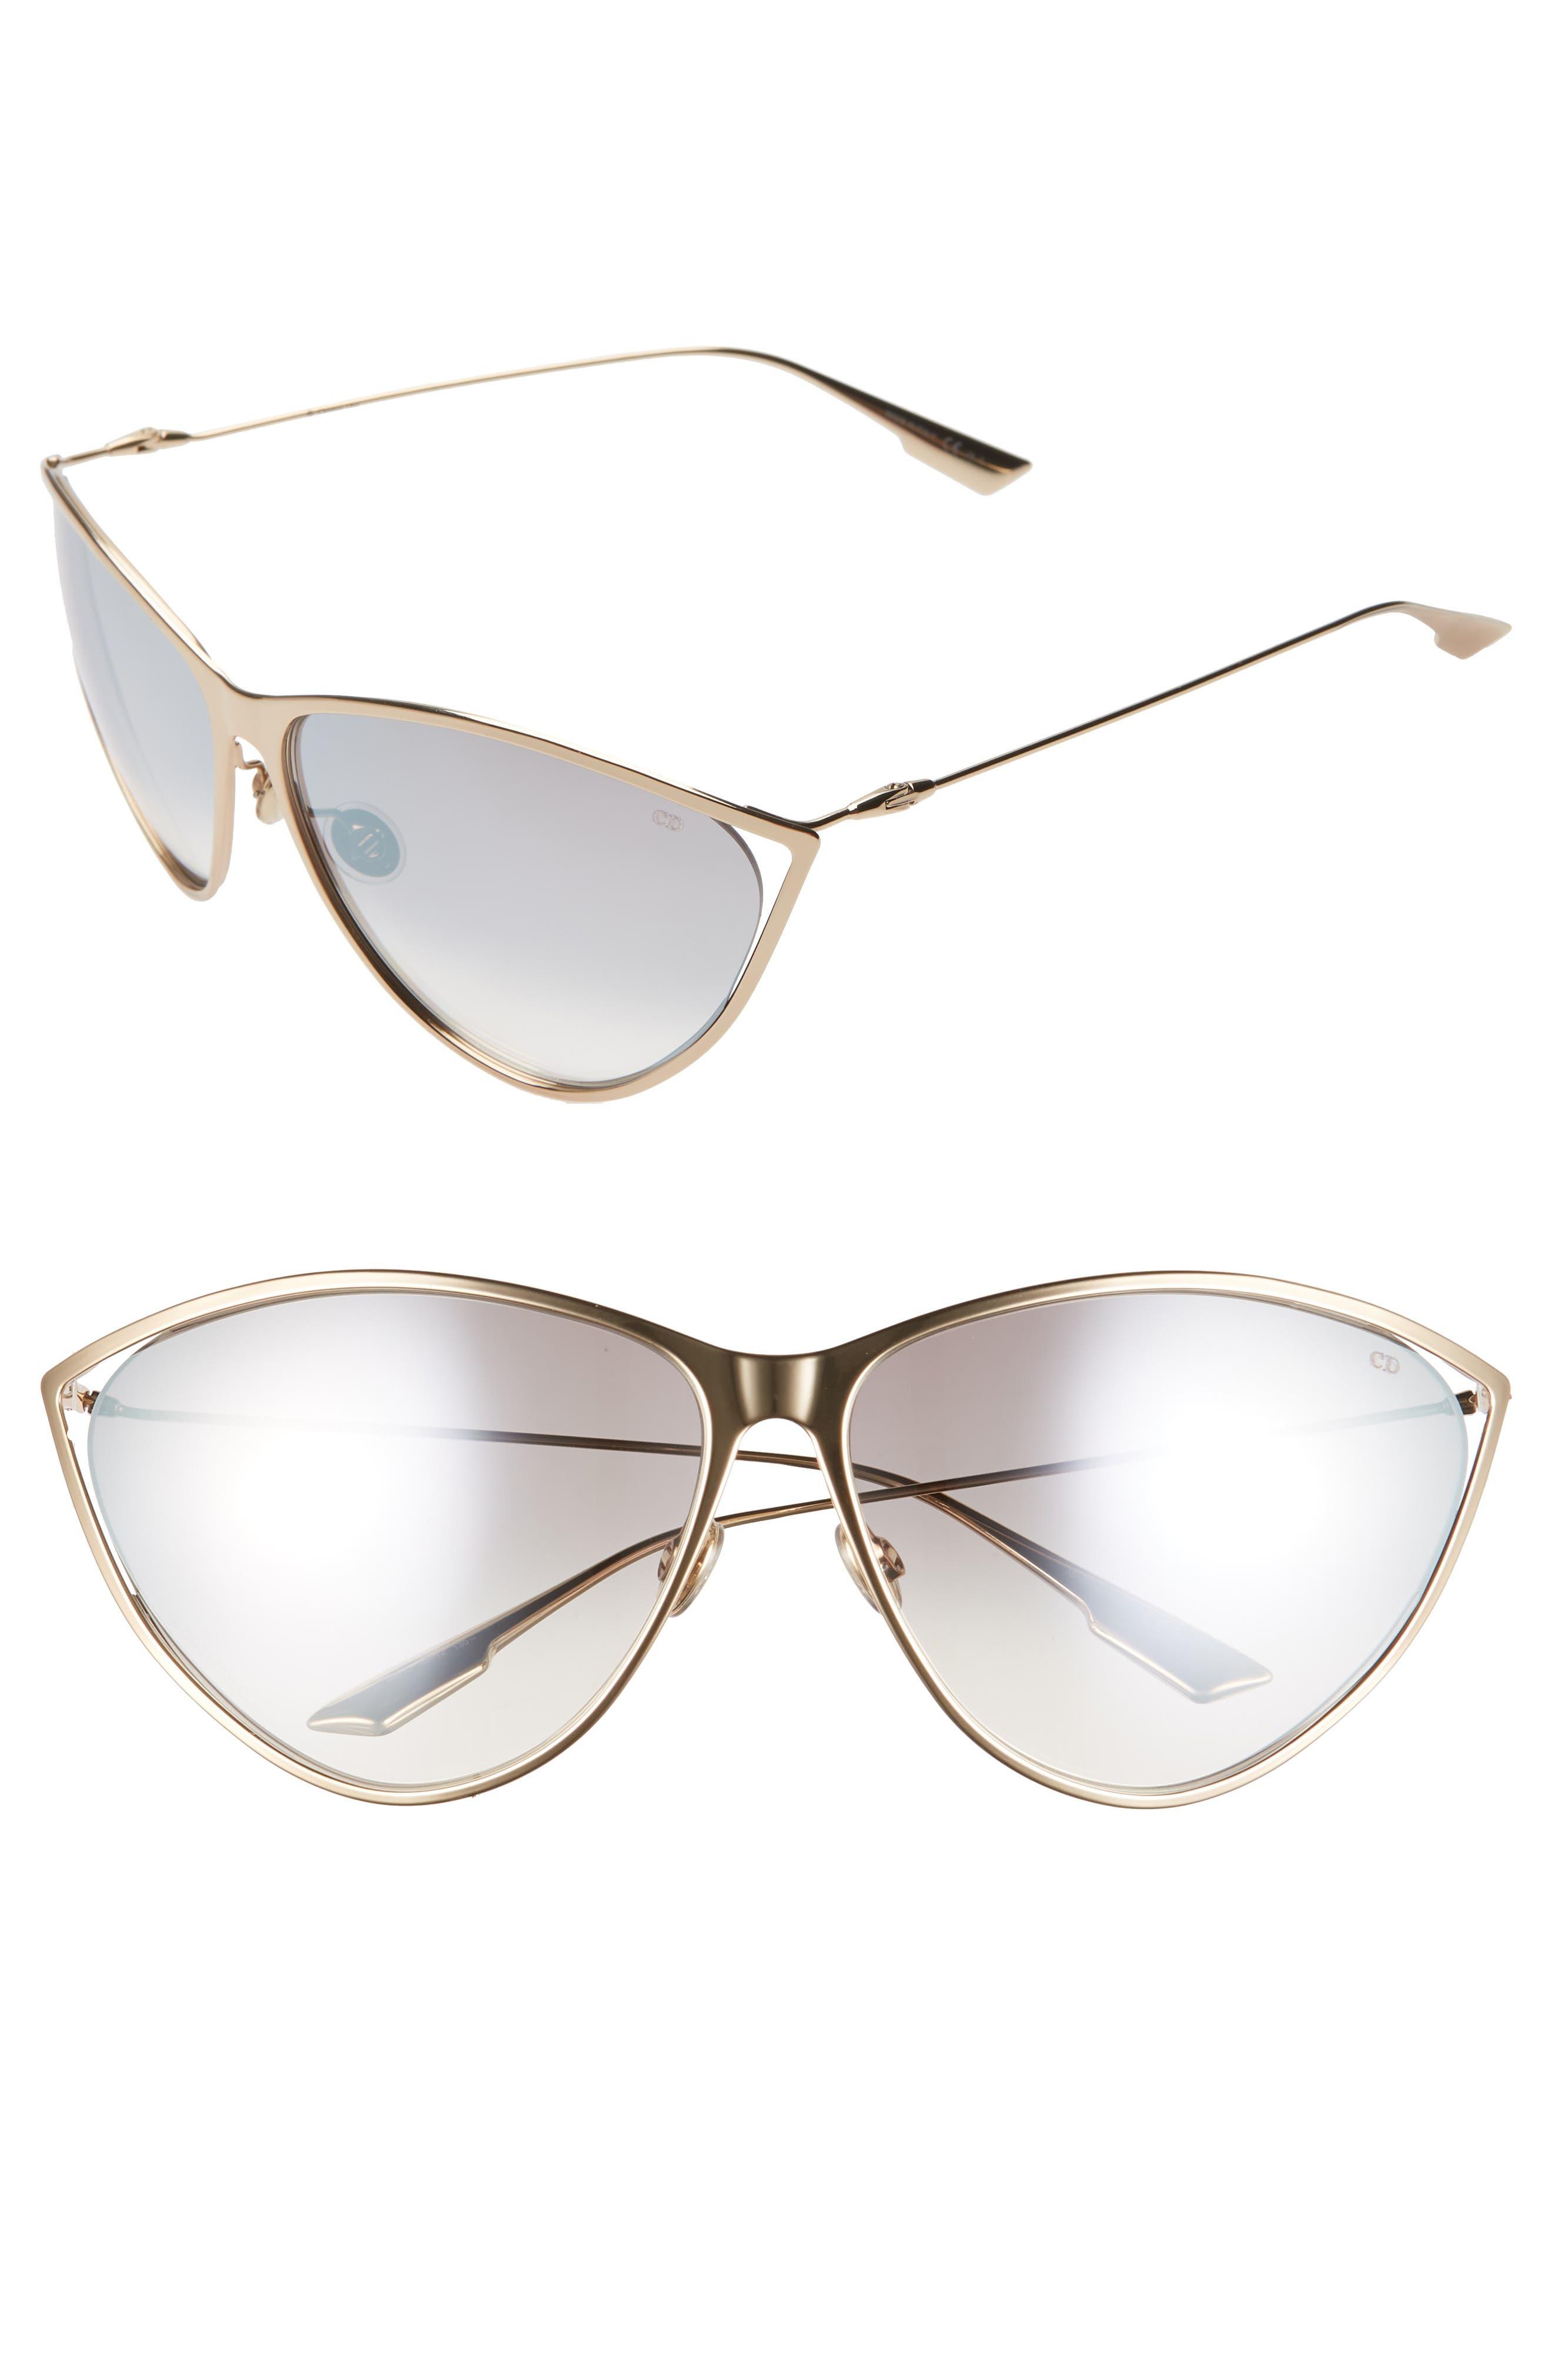 6c438cb2456cc Women s Dior Cat-Eye Sunglasses